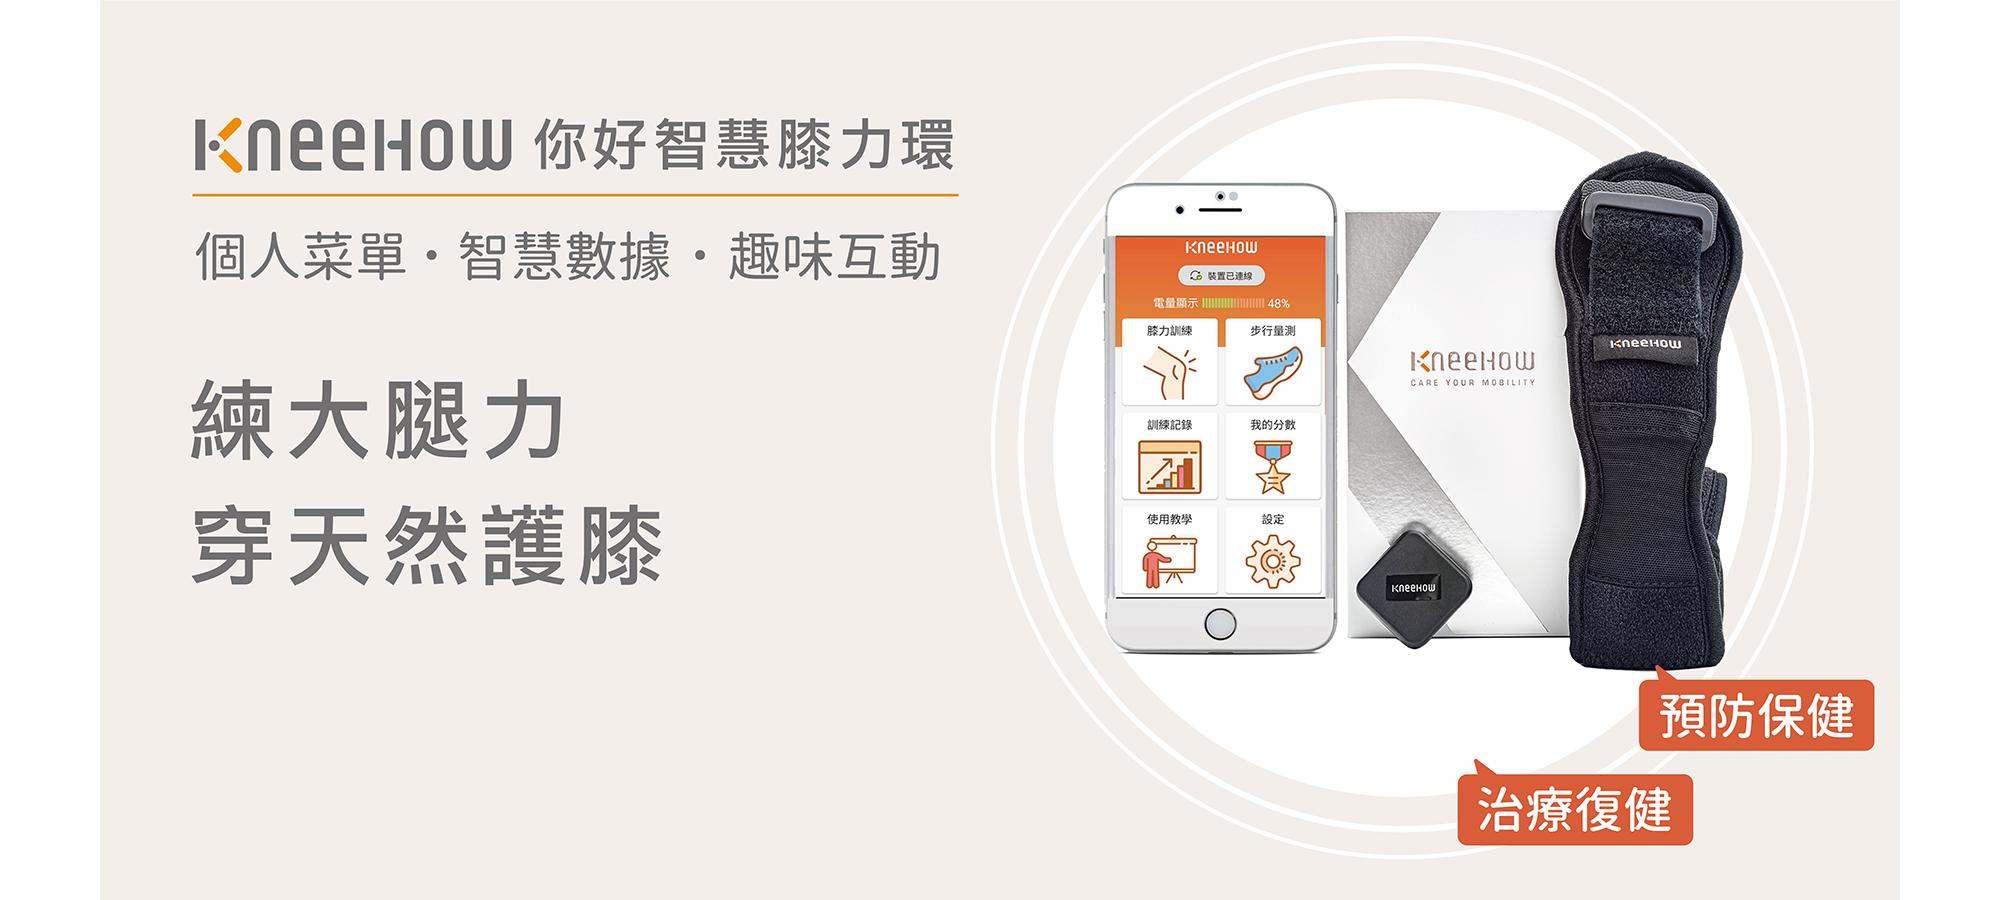 KneeHow FUJI CARE 富山福祉有限公司  